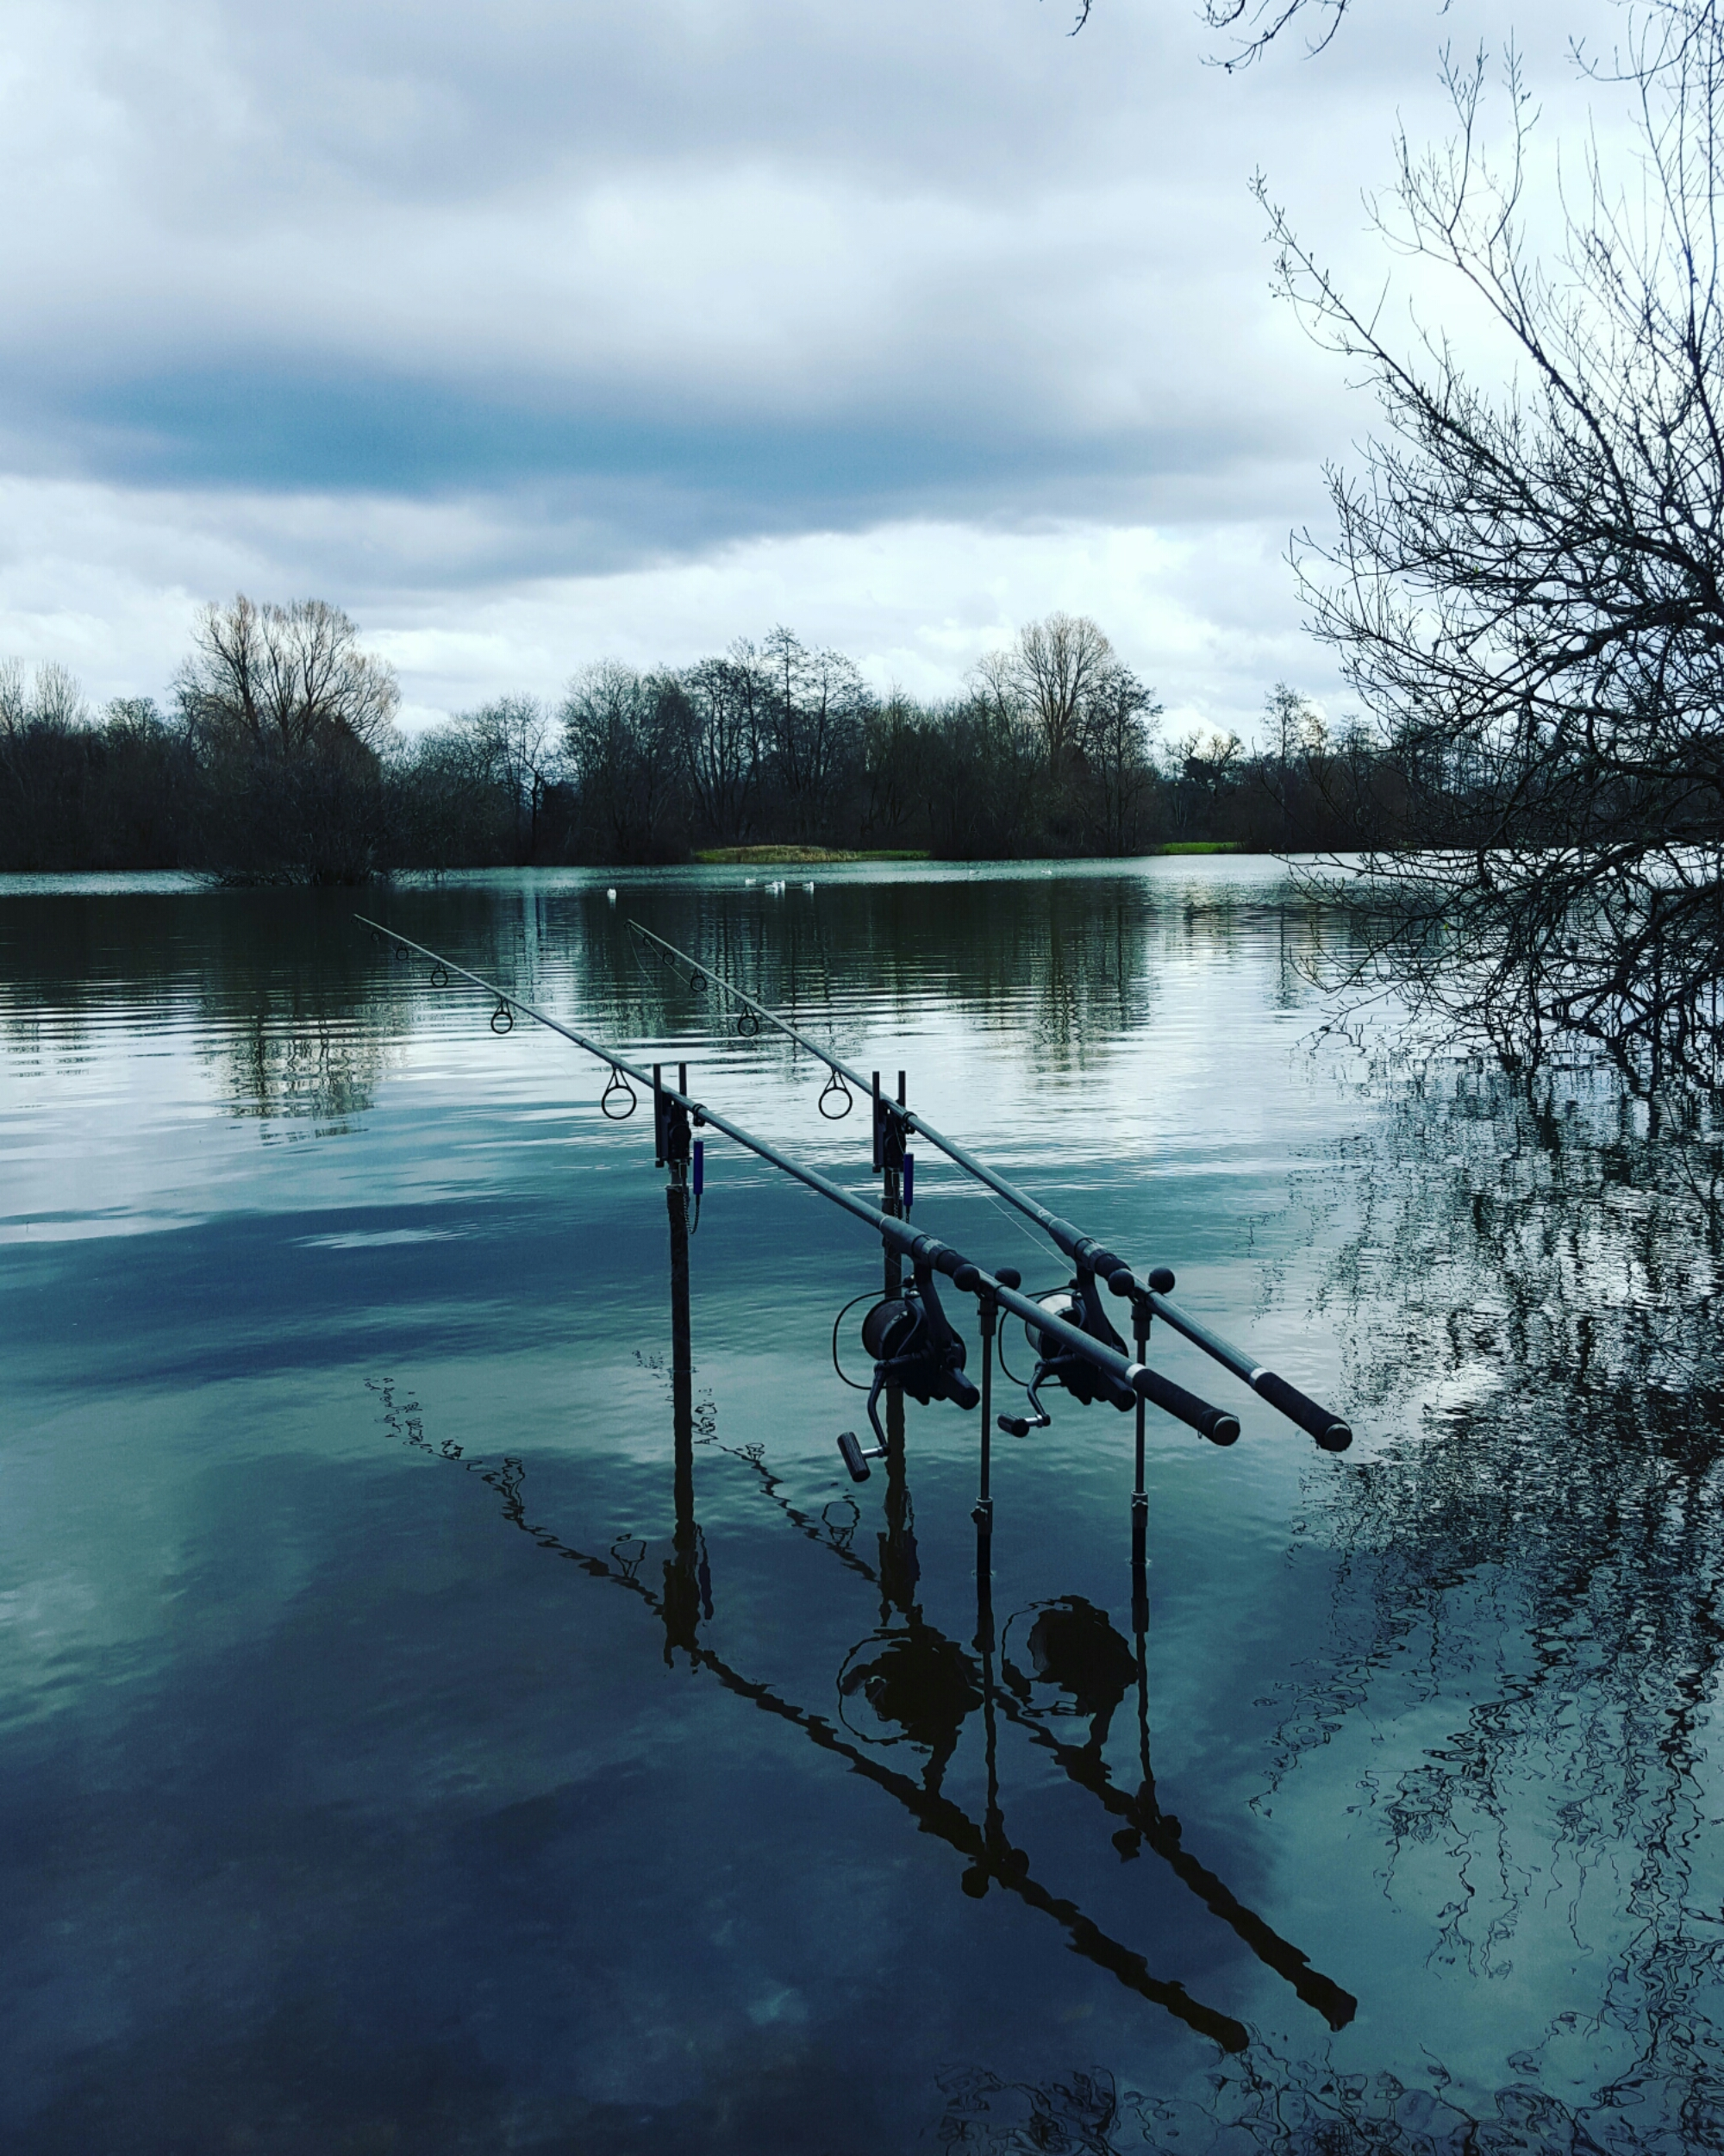 Trip no 32 carp fishing 2016 uk carp coarse fishing for Fishing videos 2016